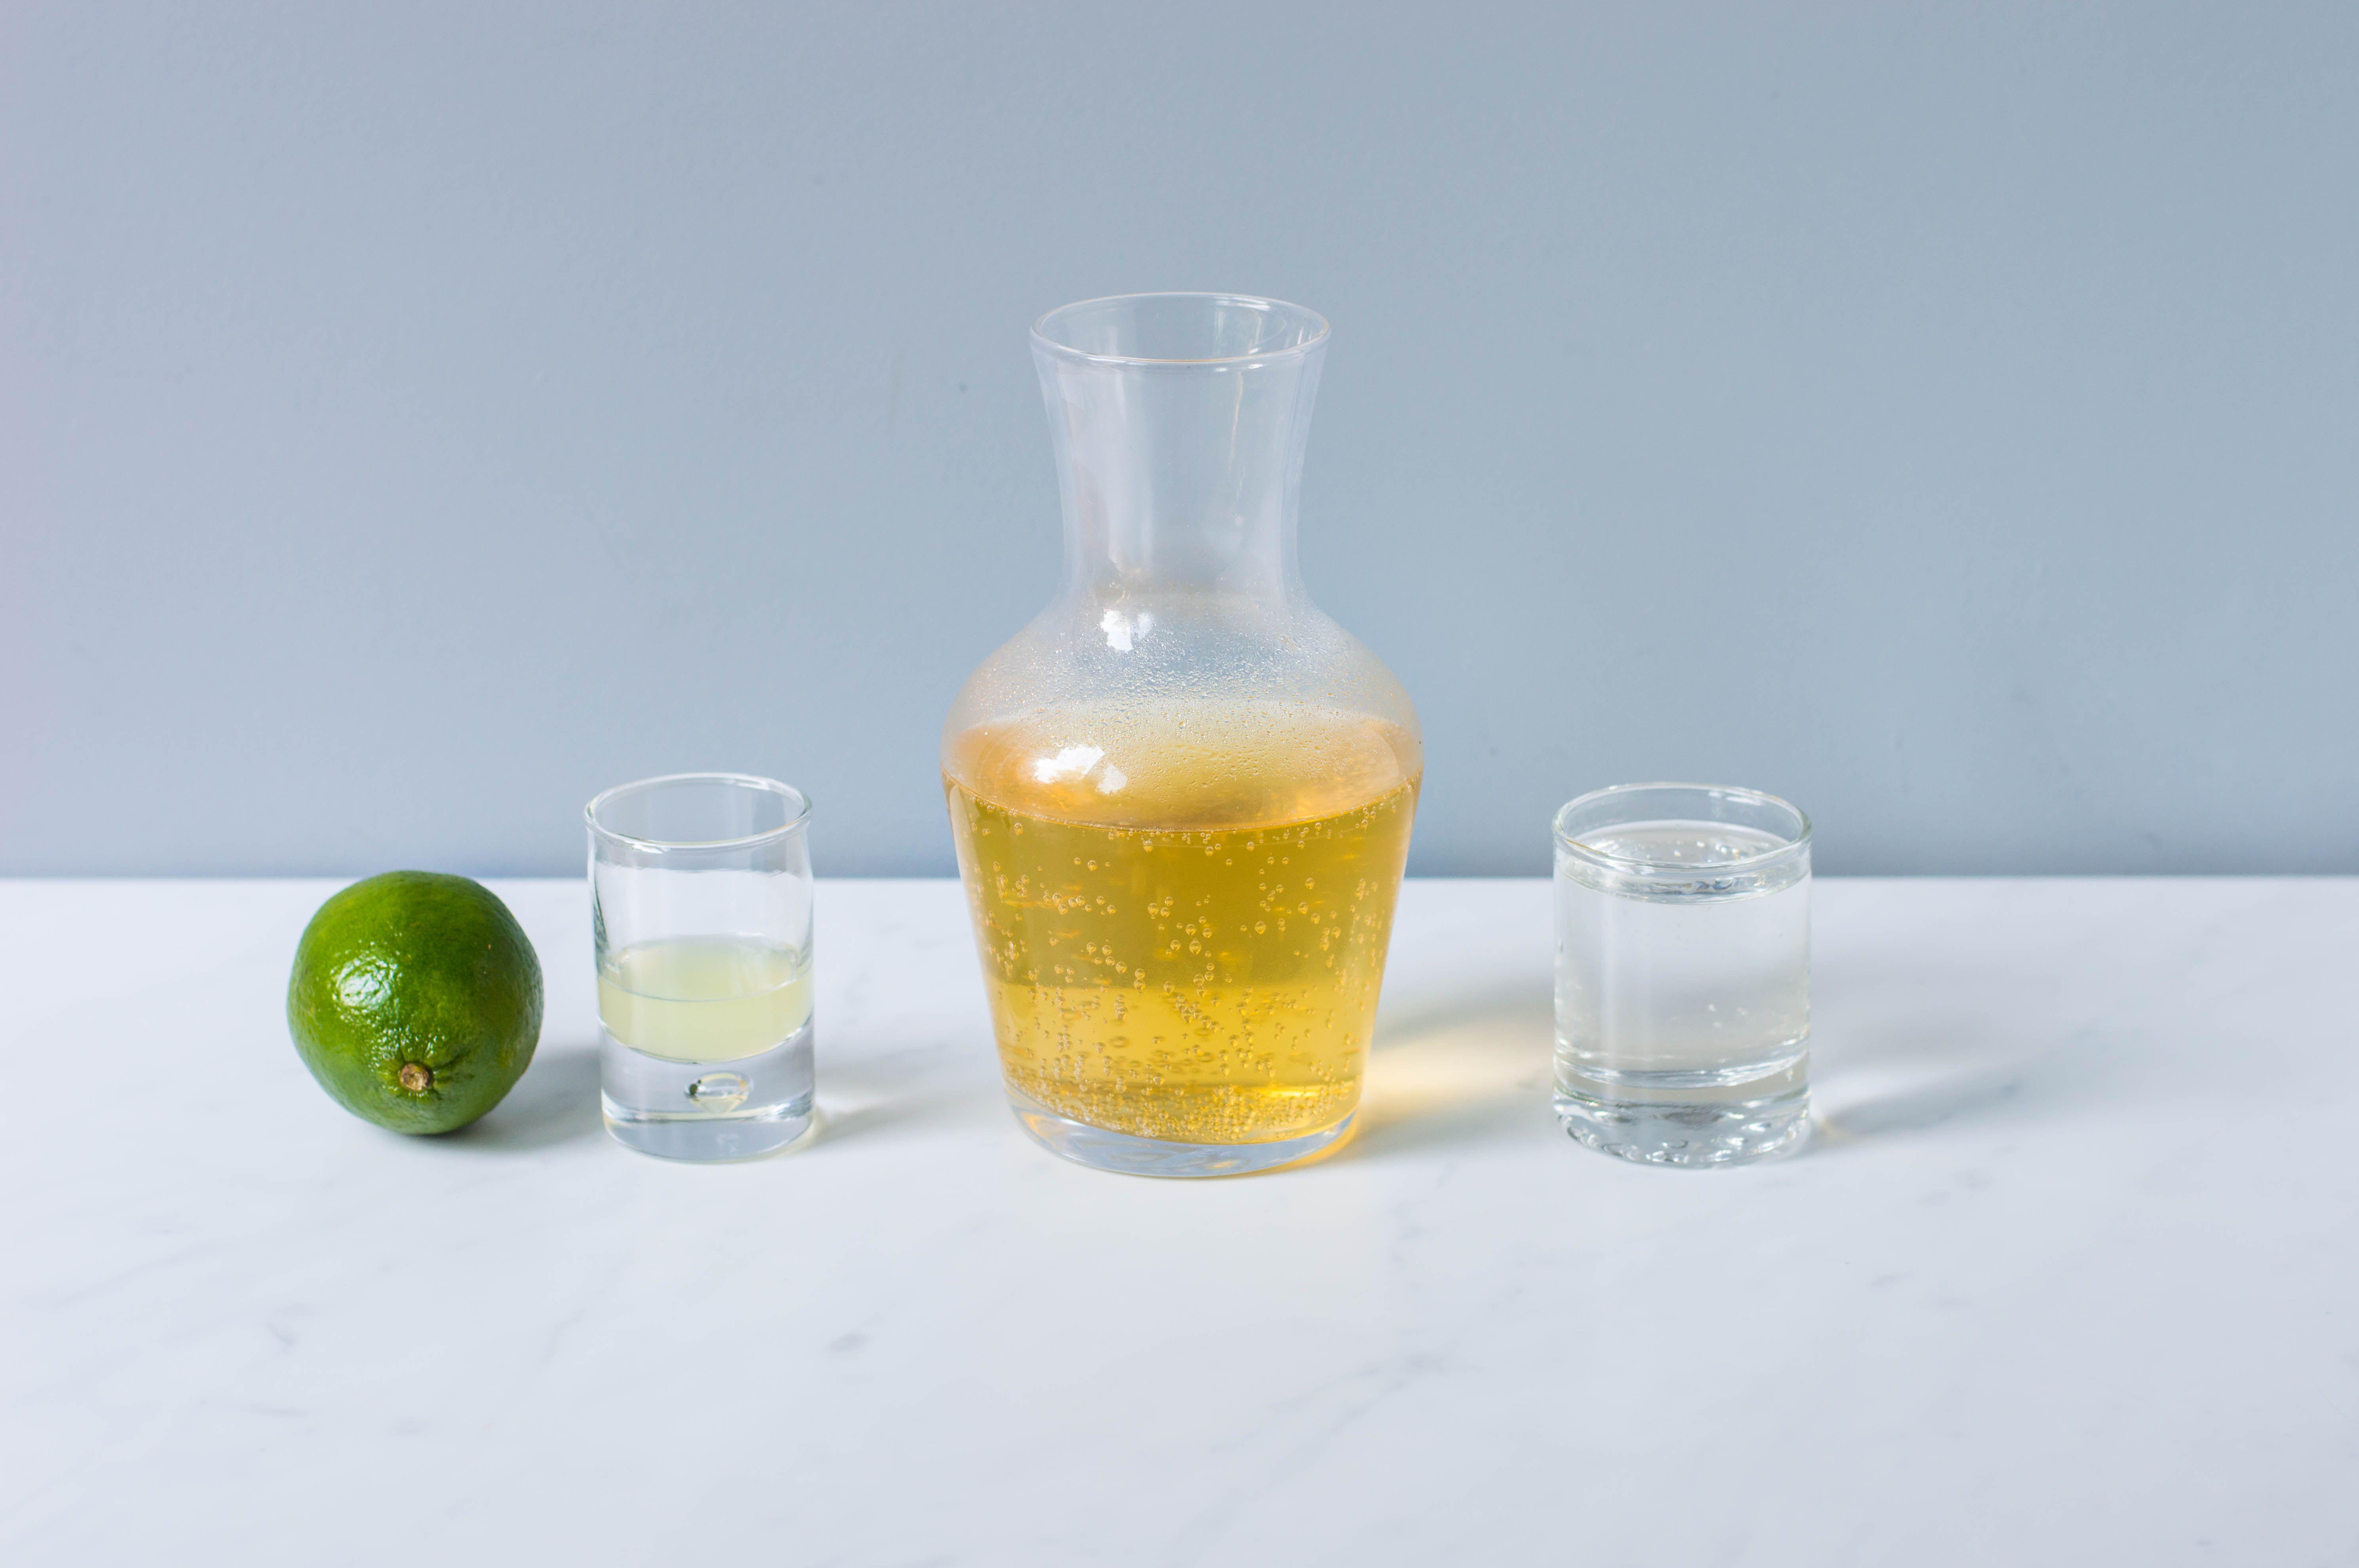 Foghorn cocktail recipe ingredients